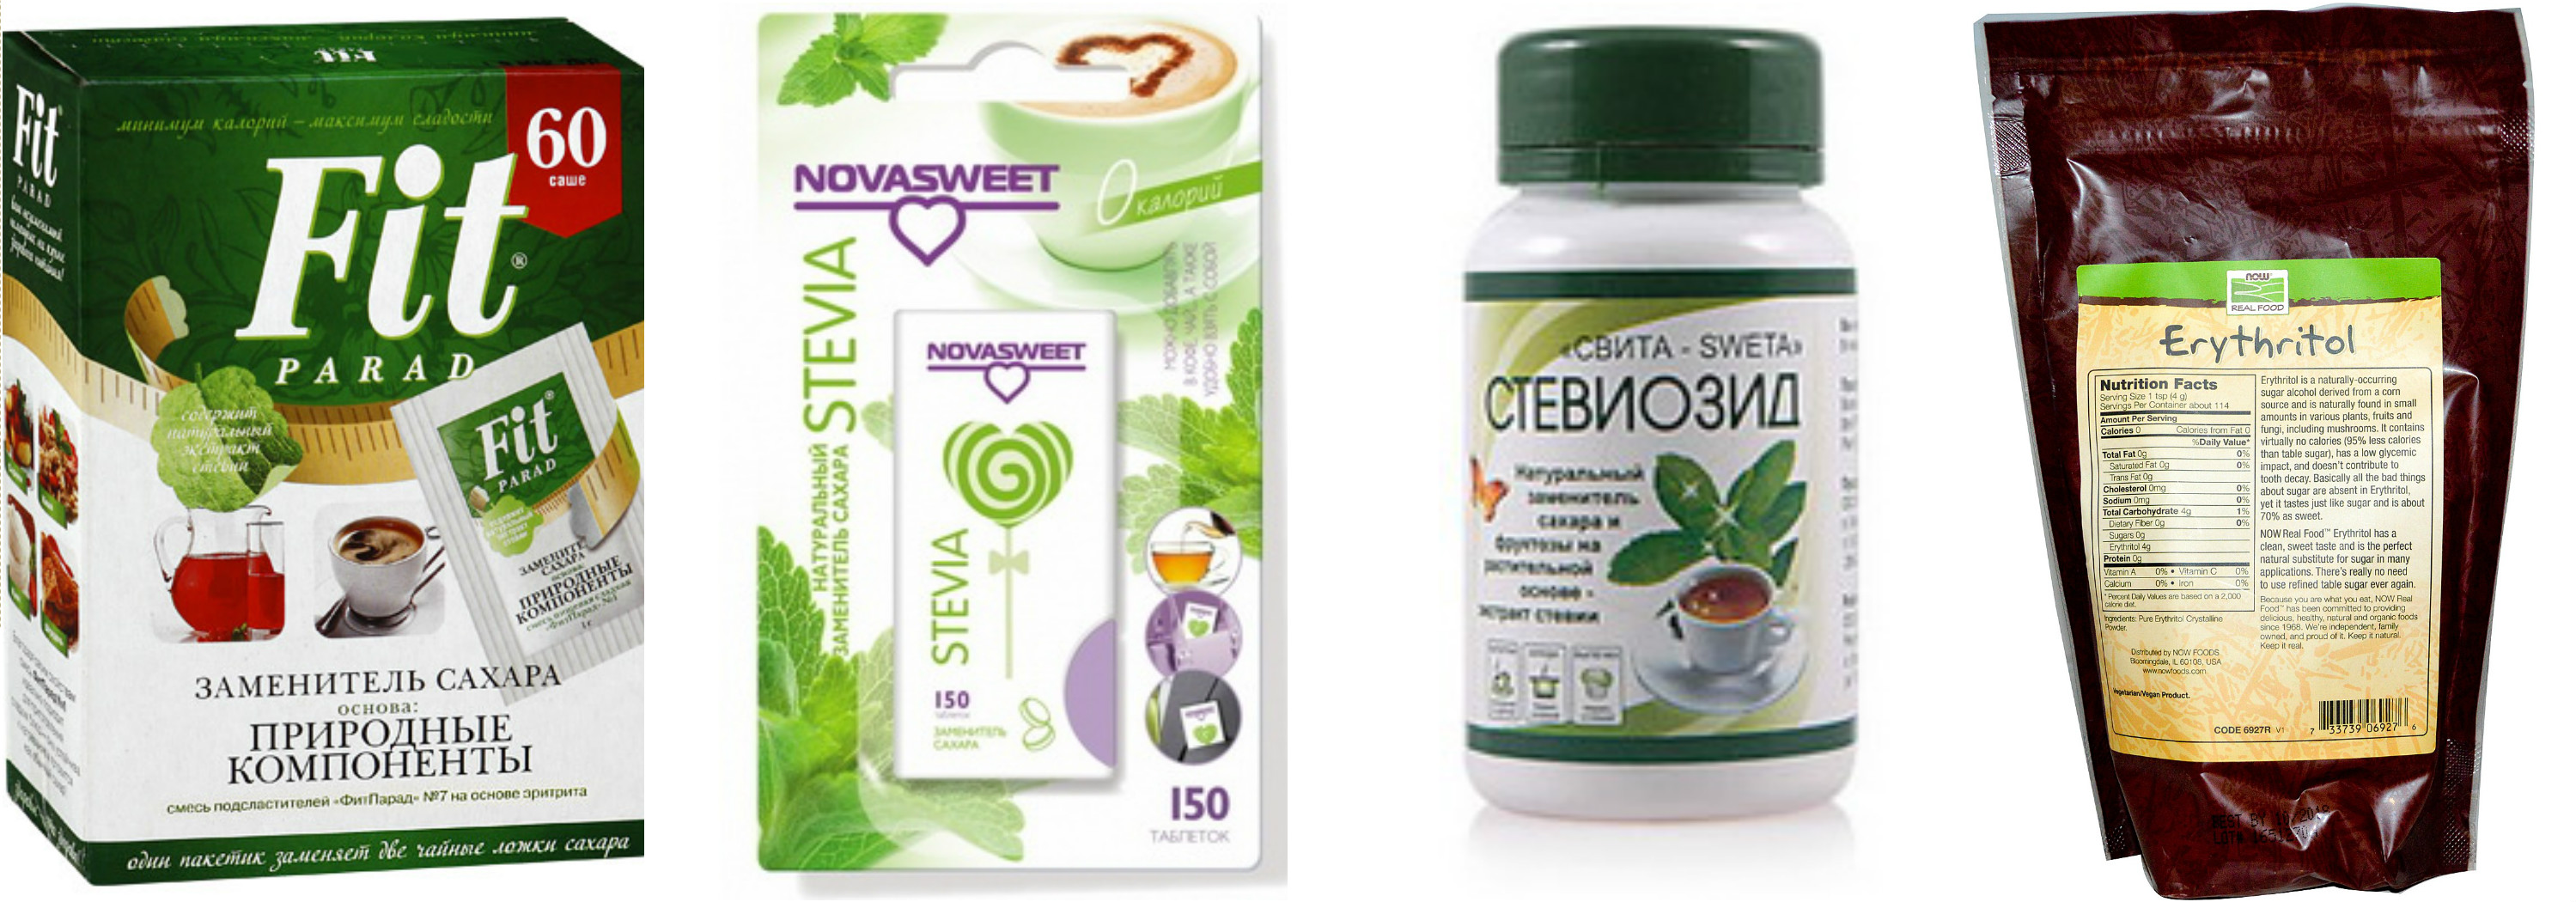 Clear Organic Honey 340 g  Sweeteners Sugar